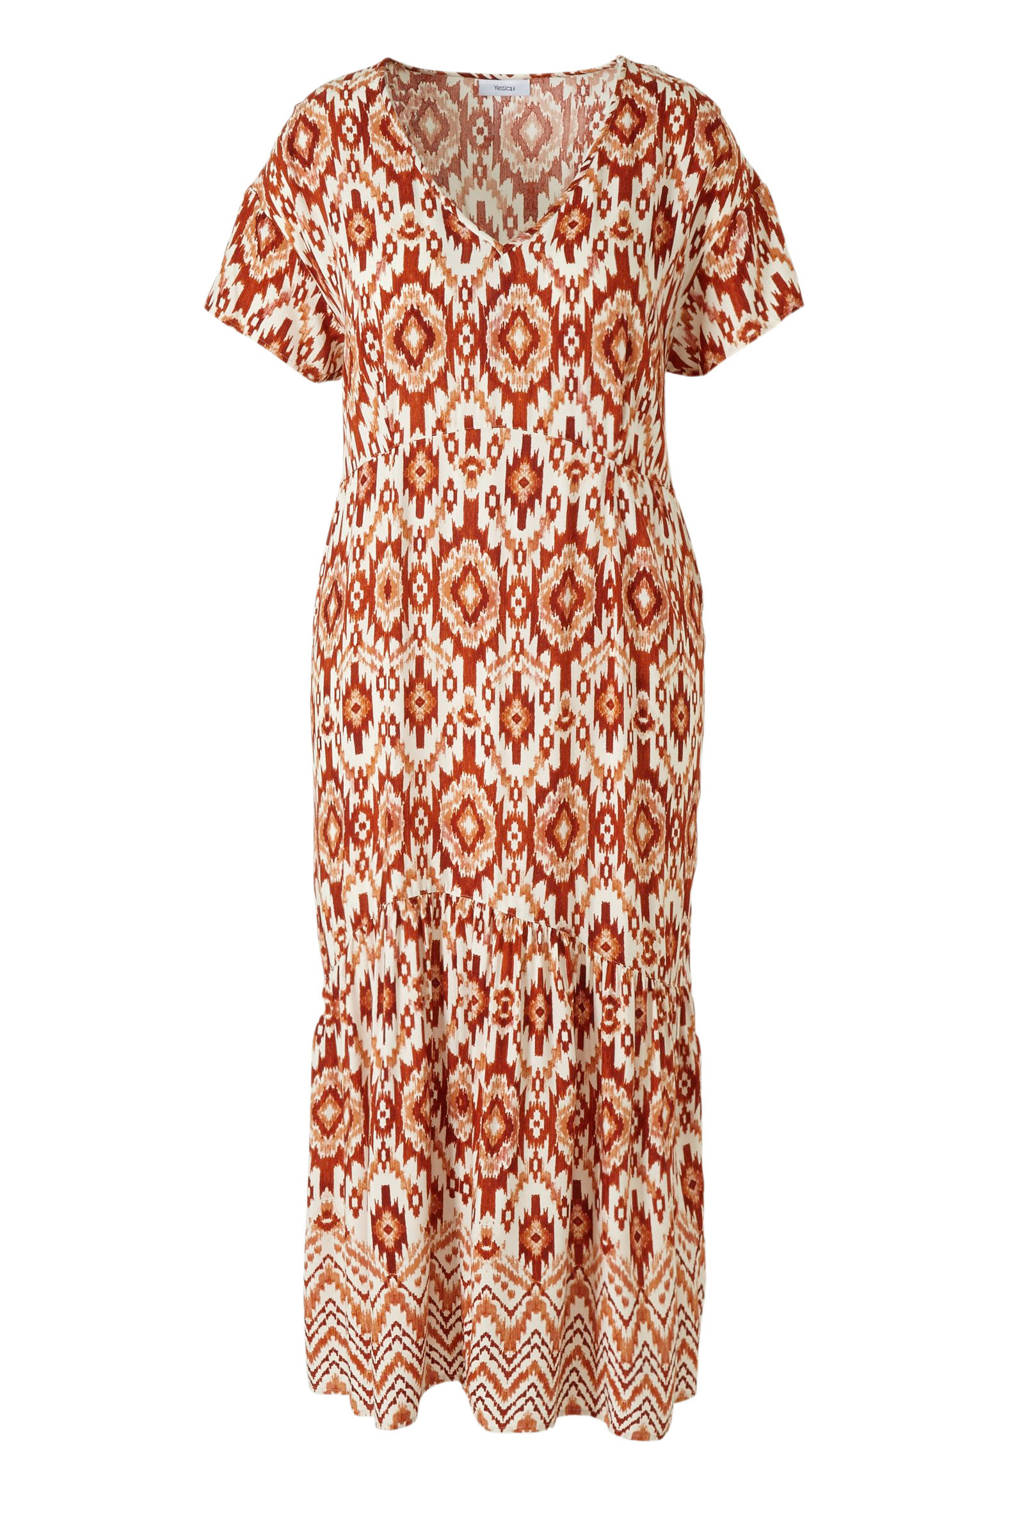 C&A XL Yessica jurk met grafische print oranje/wit, Oranje/wit